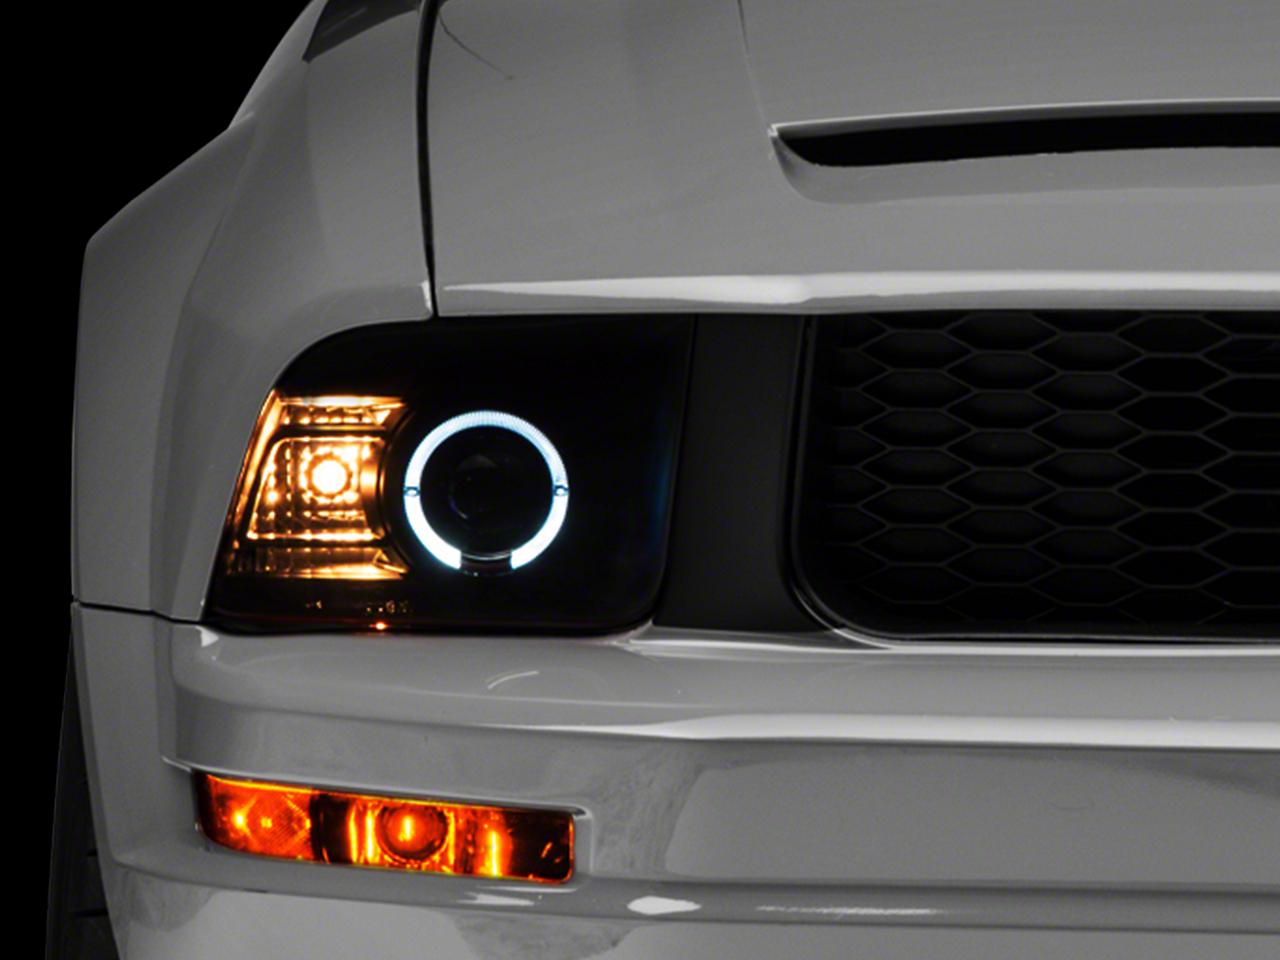 Raxiom 2010 Style Smoked Headlights (05-09 GT, V6)